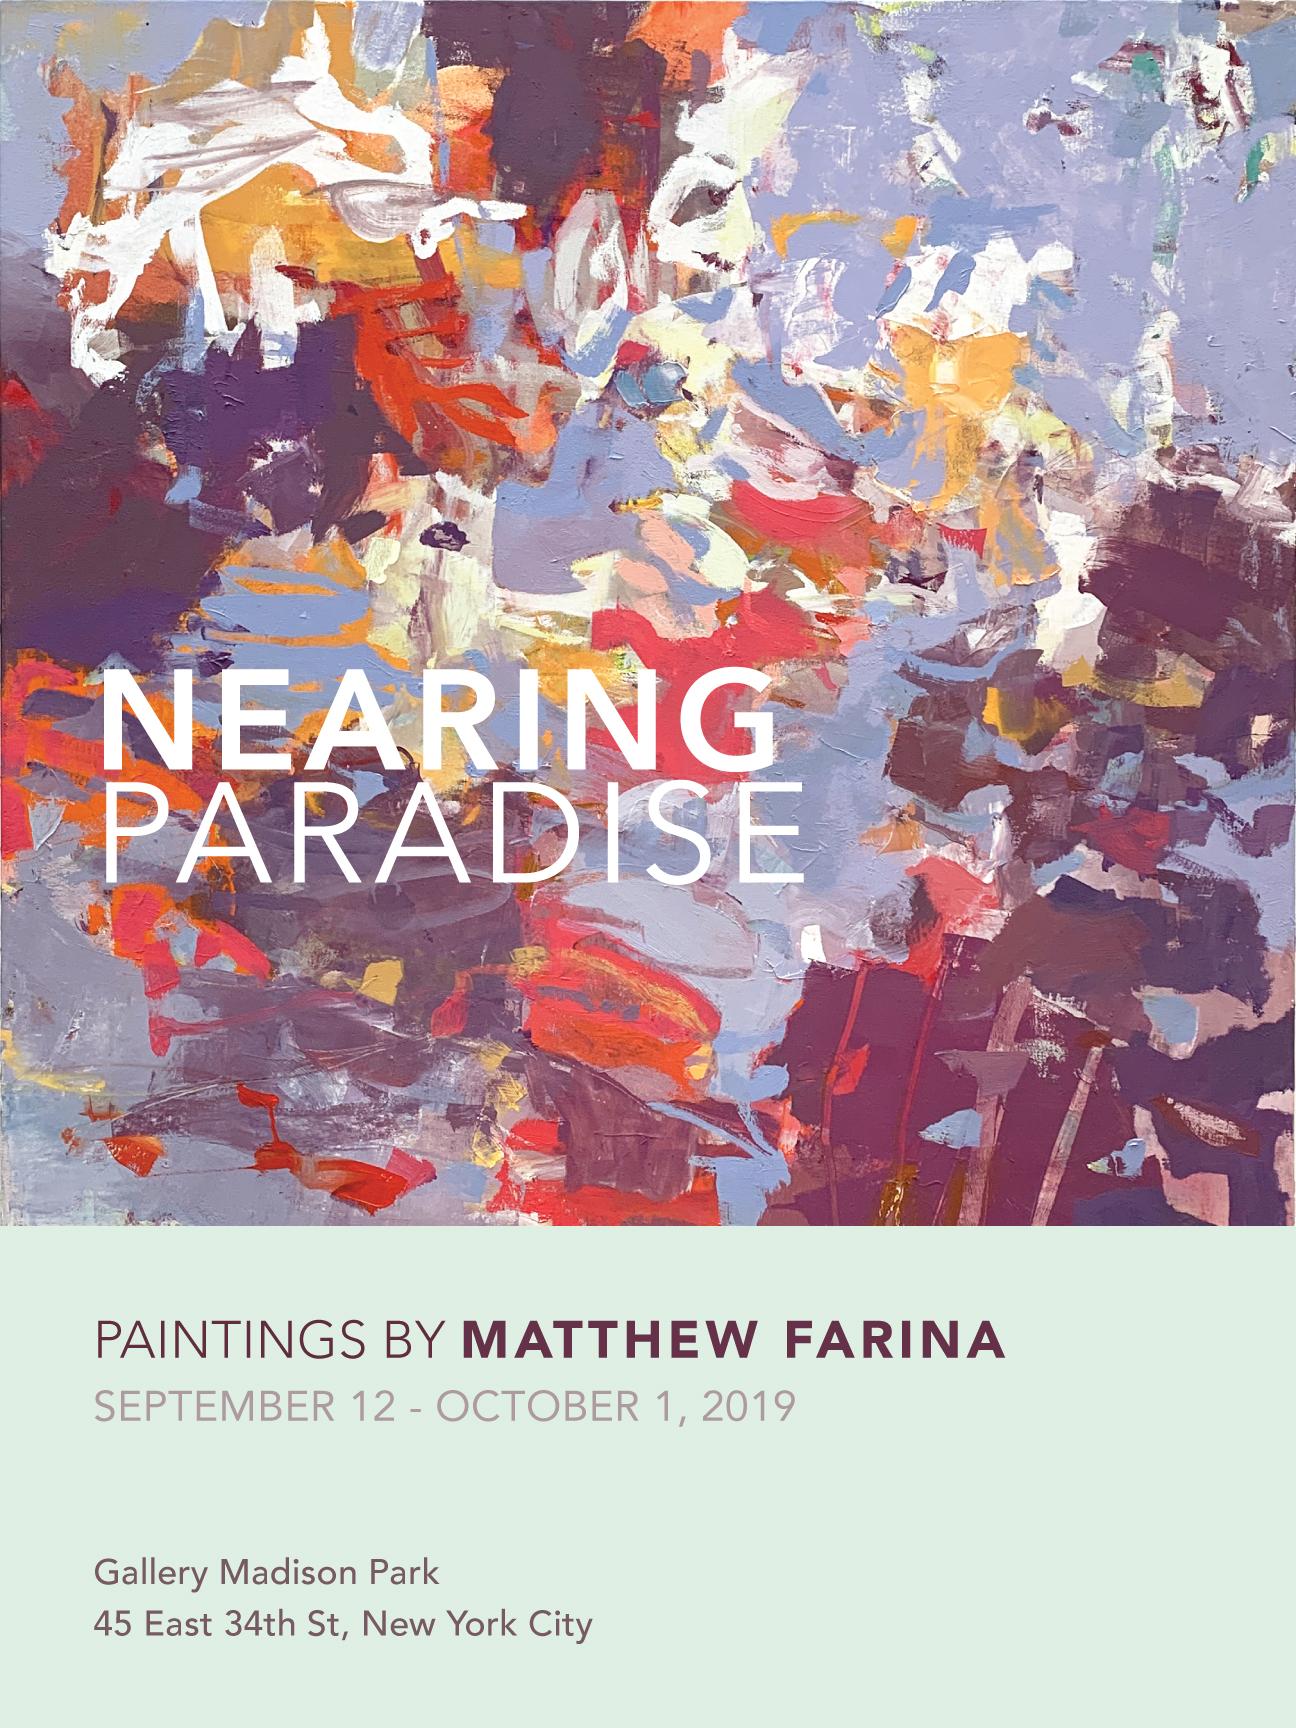 nearing-paradise-poster-18x24-2019-08-28.jpg